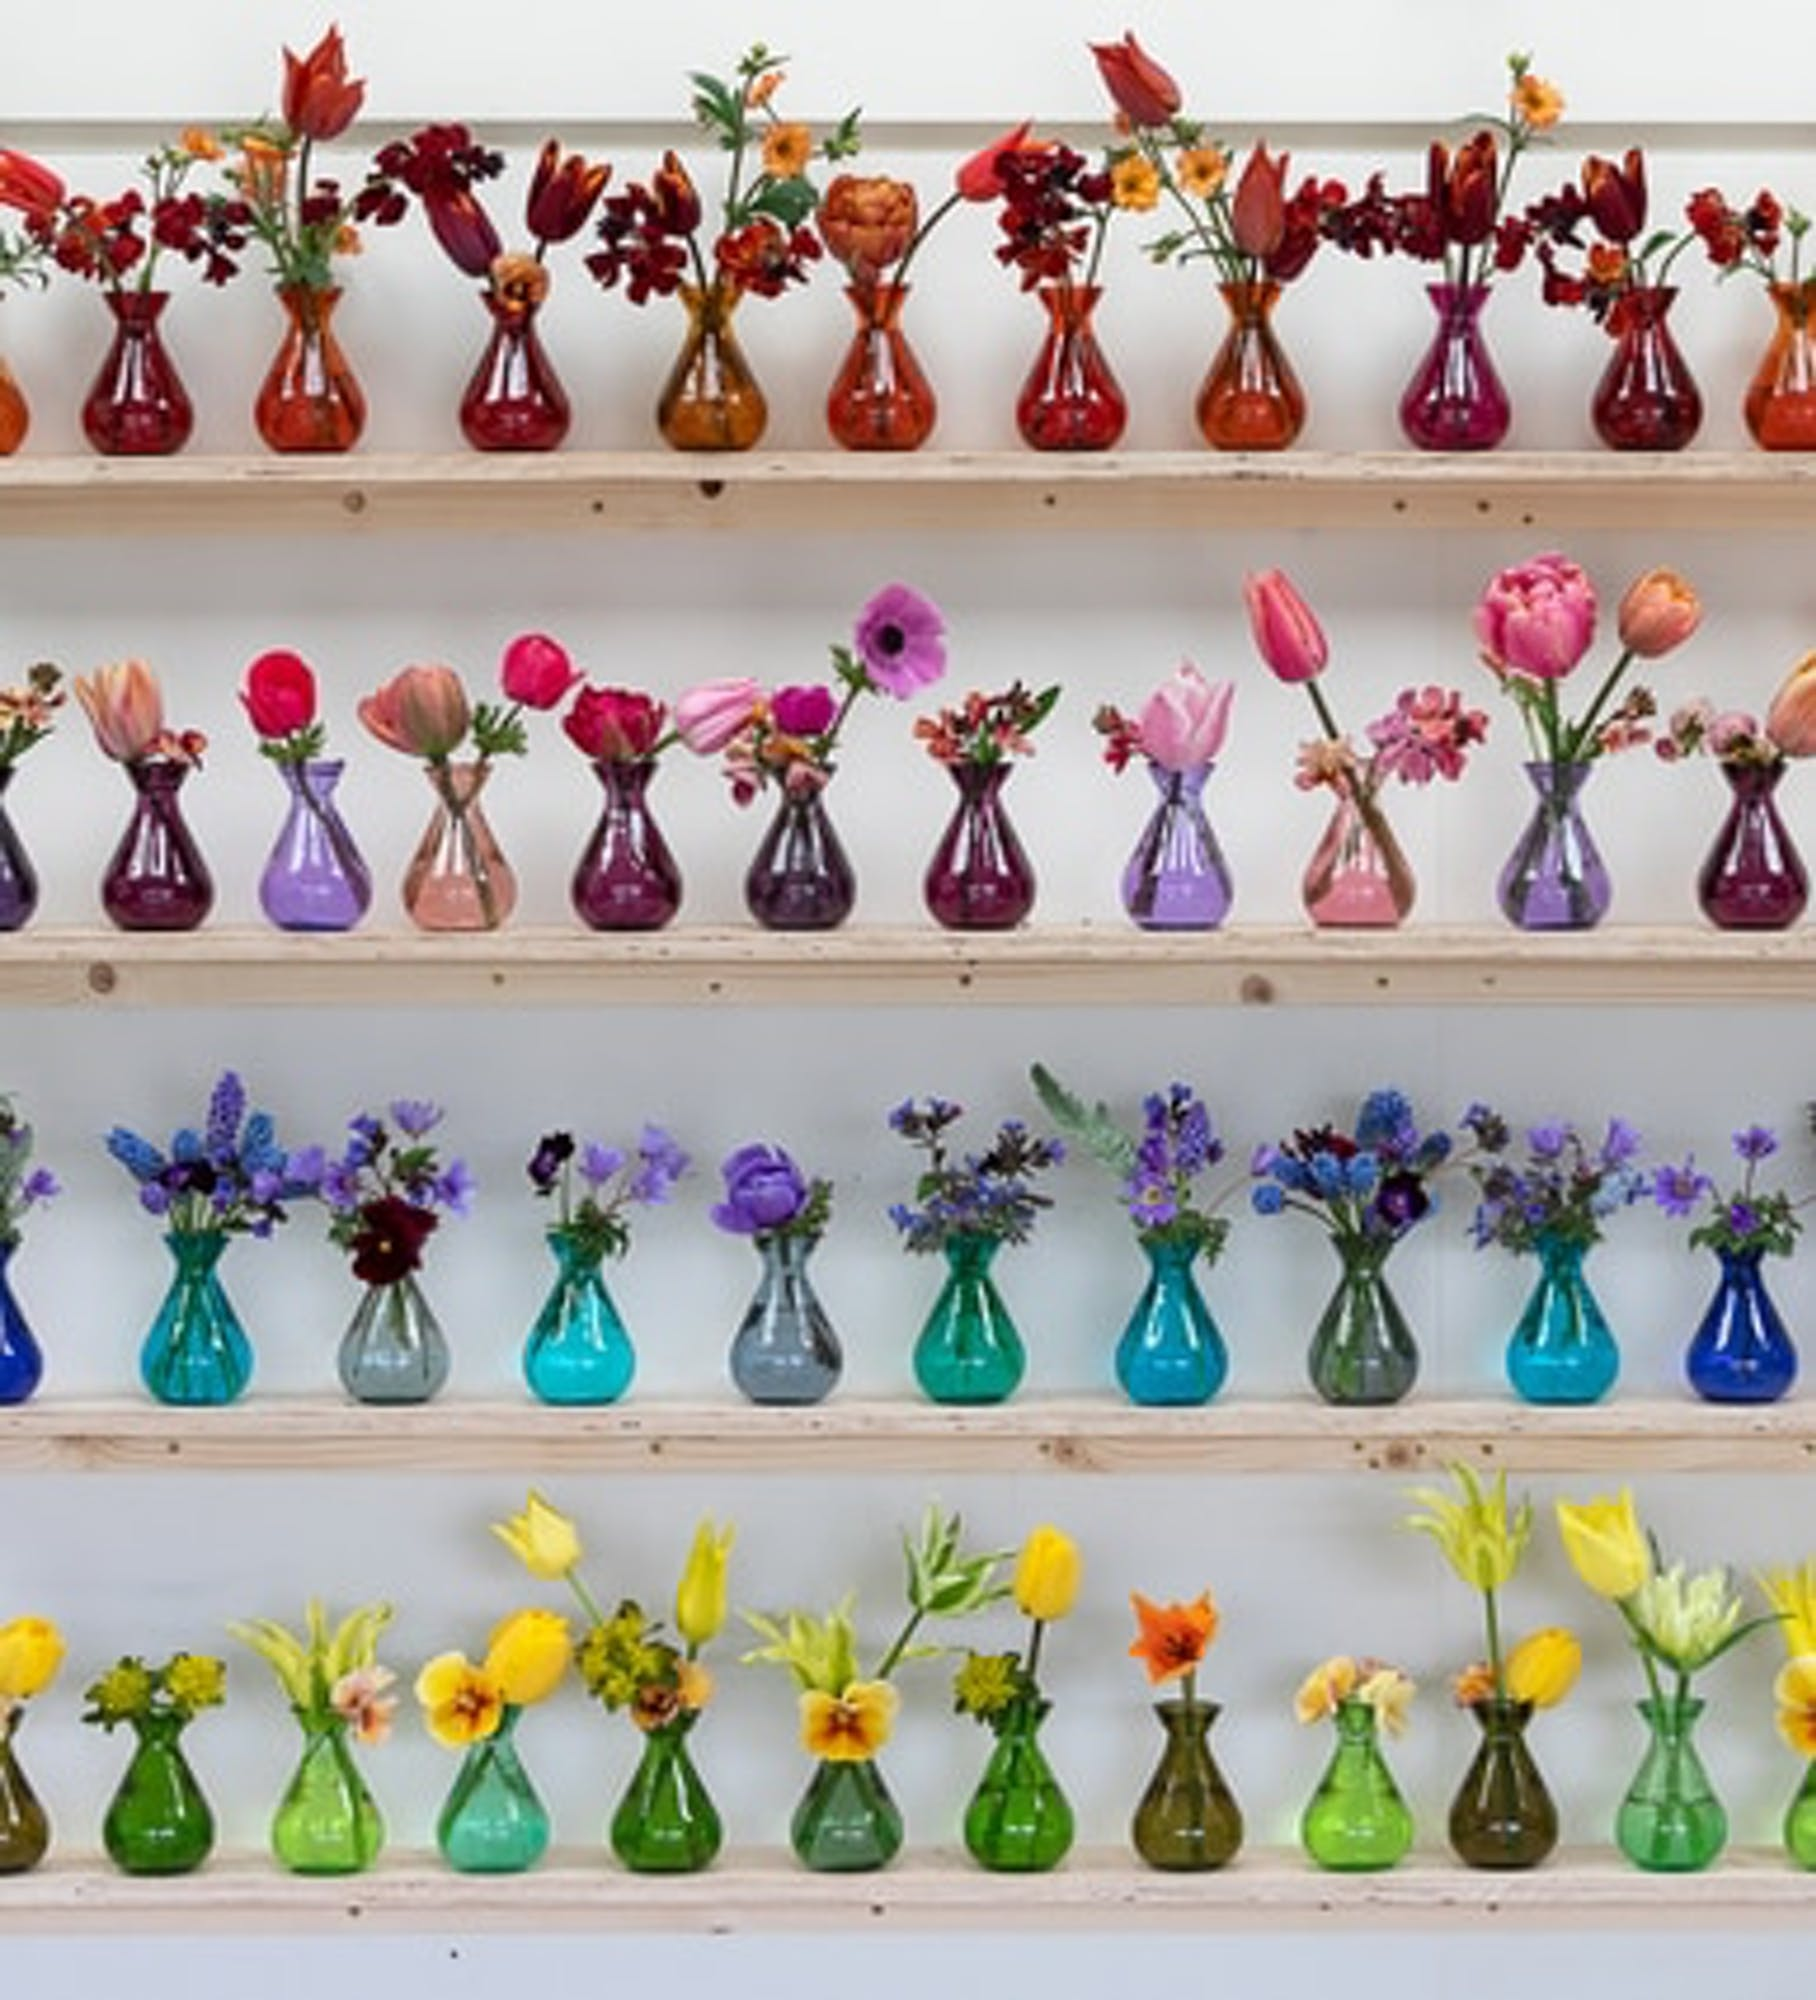 Individual Jewel Vases